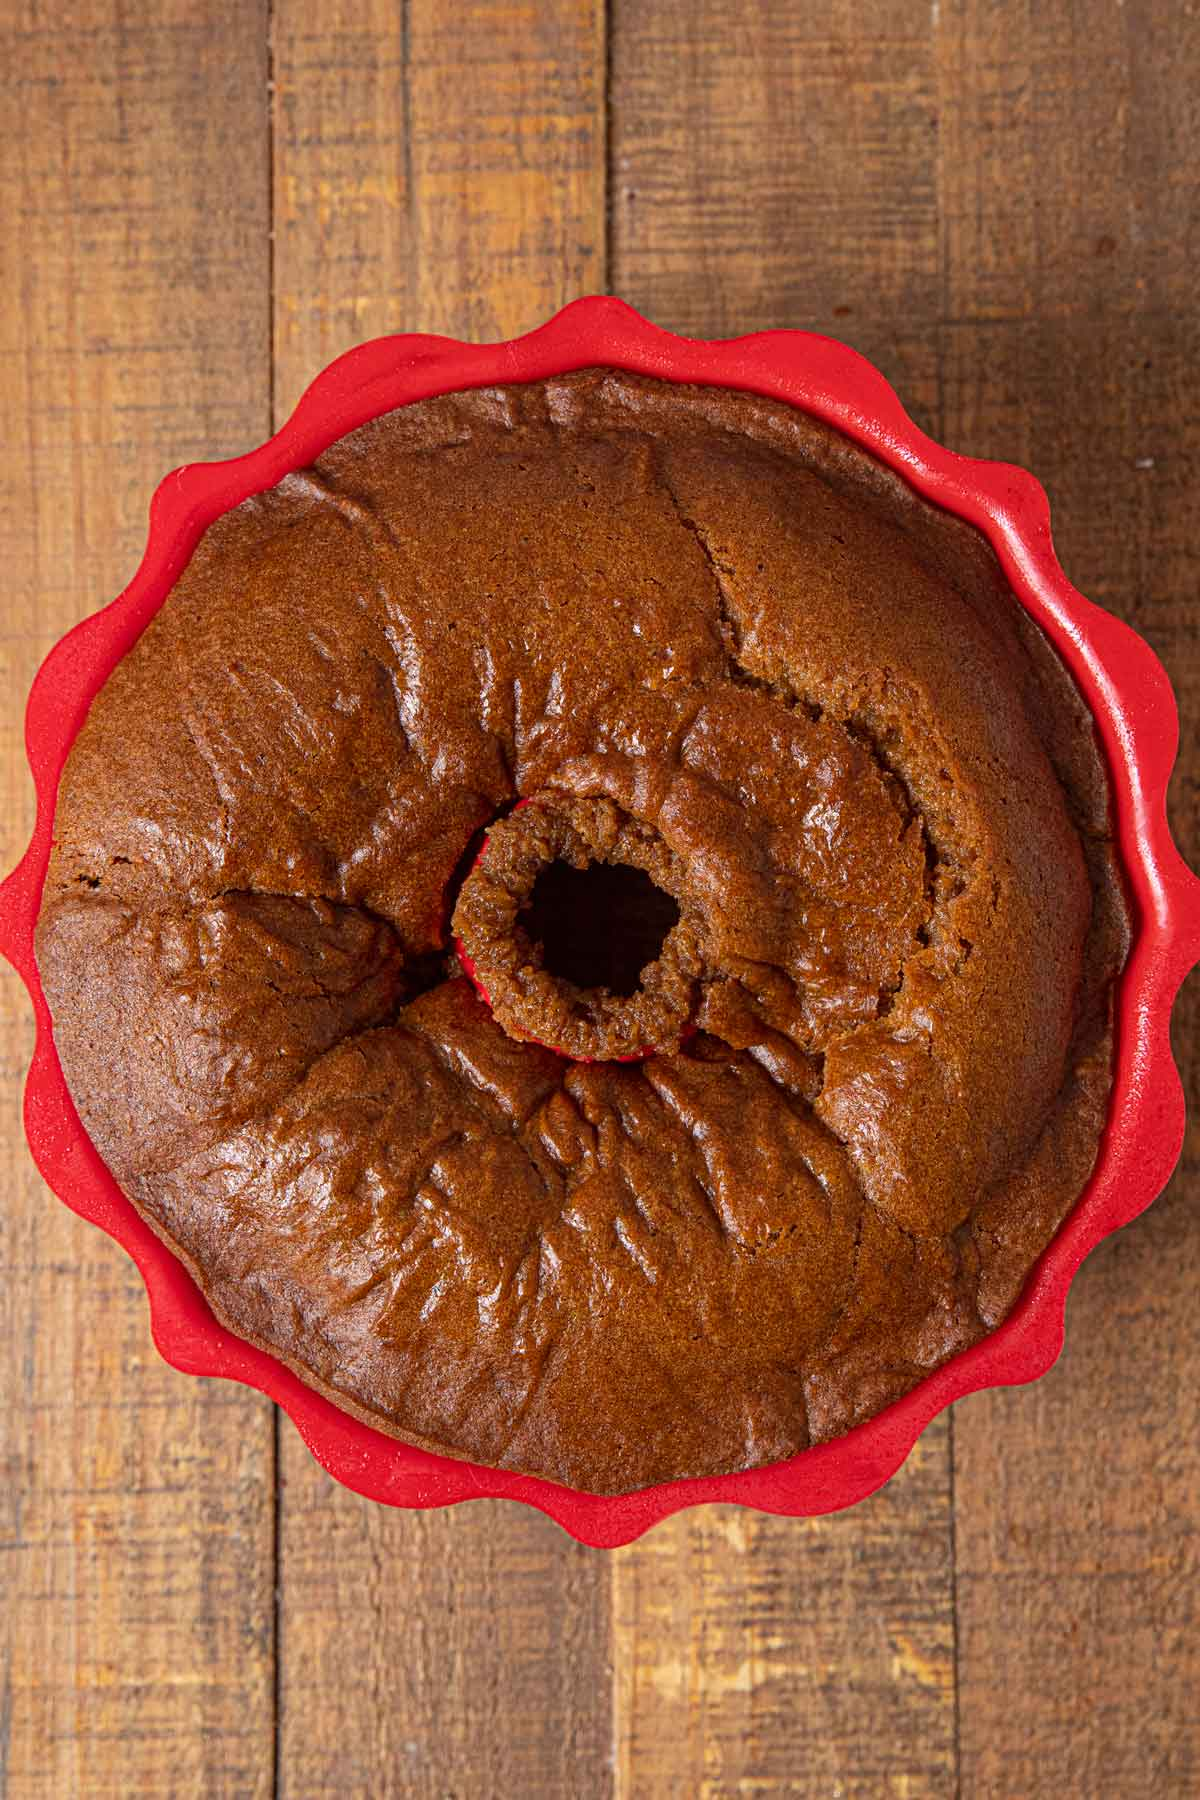 Pumpkin Bundt Cake baked in red silicone bundt cake pan